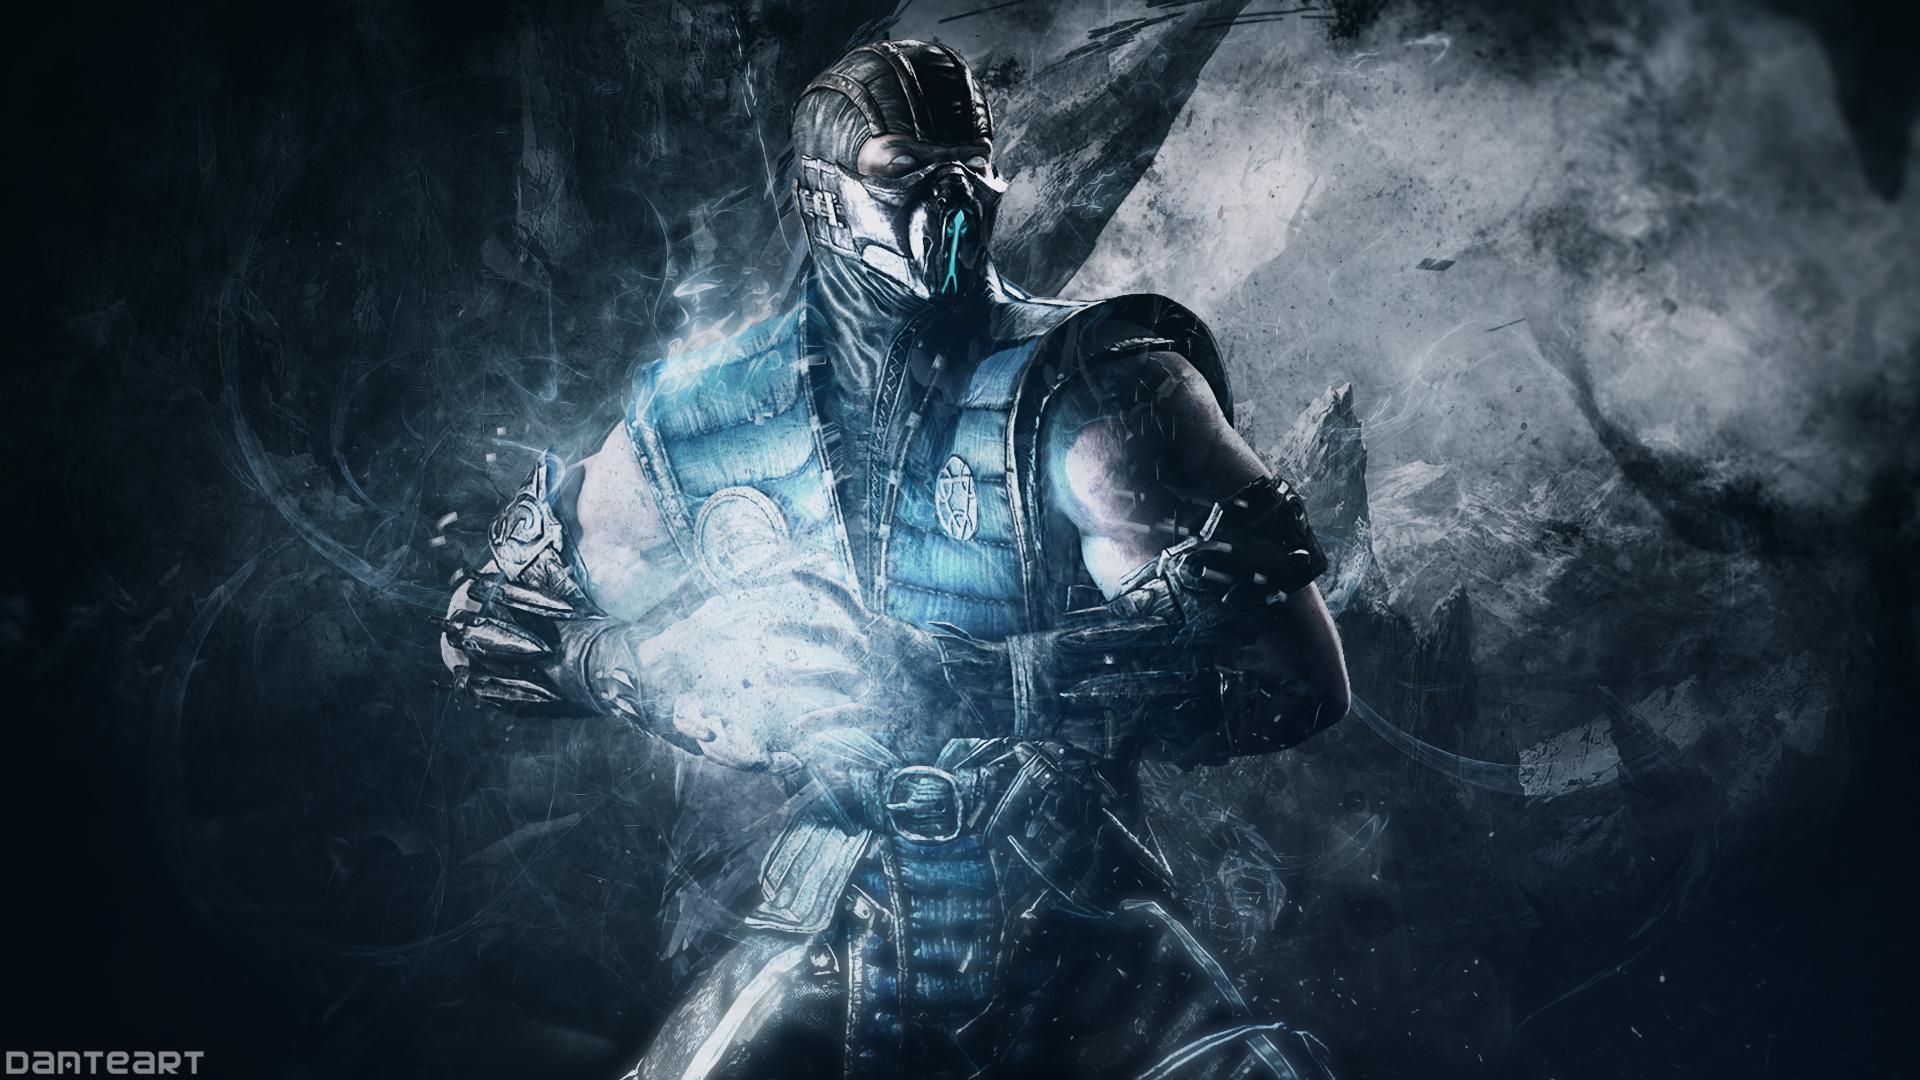 Mortal Kombat X Sub Zero Wallpaper By DanteArtWallpapers